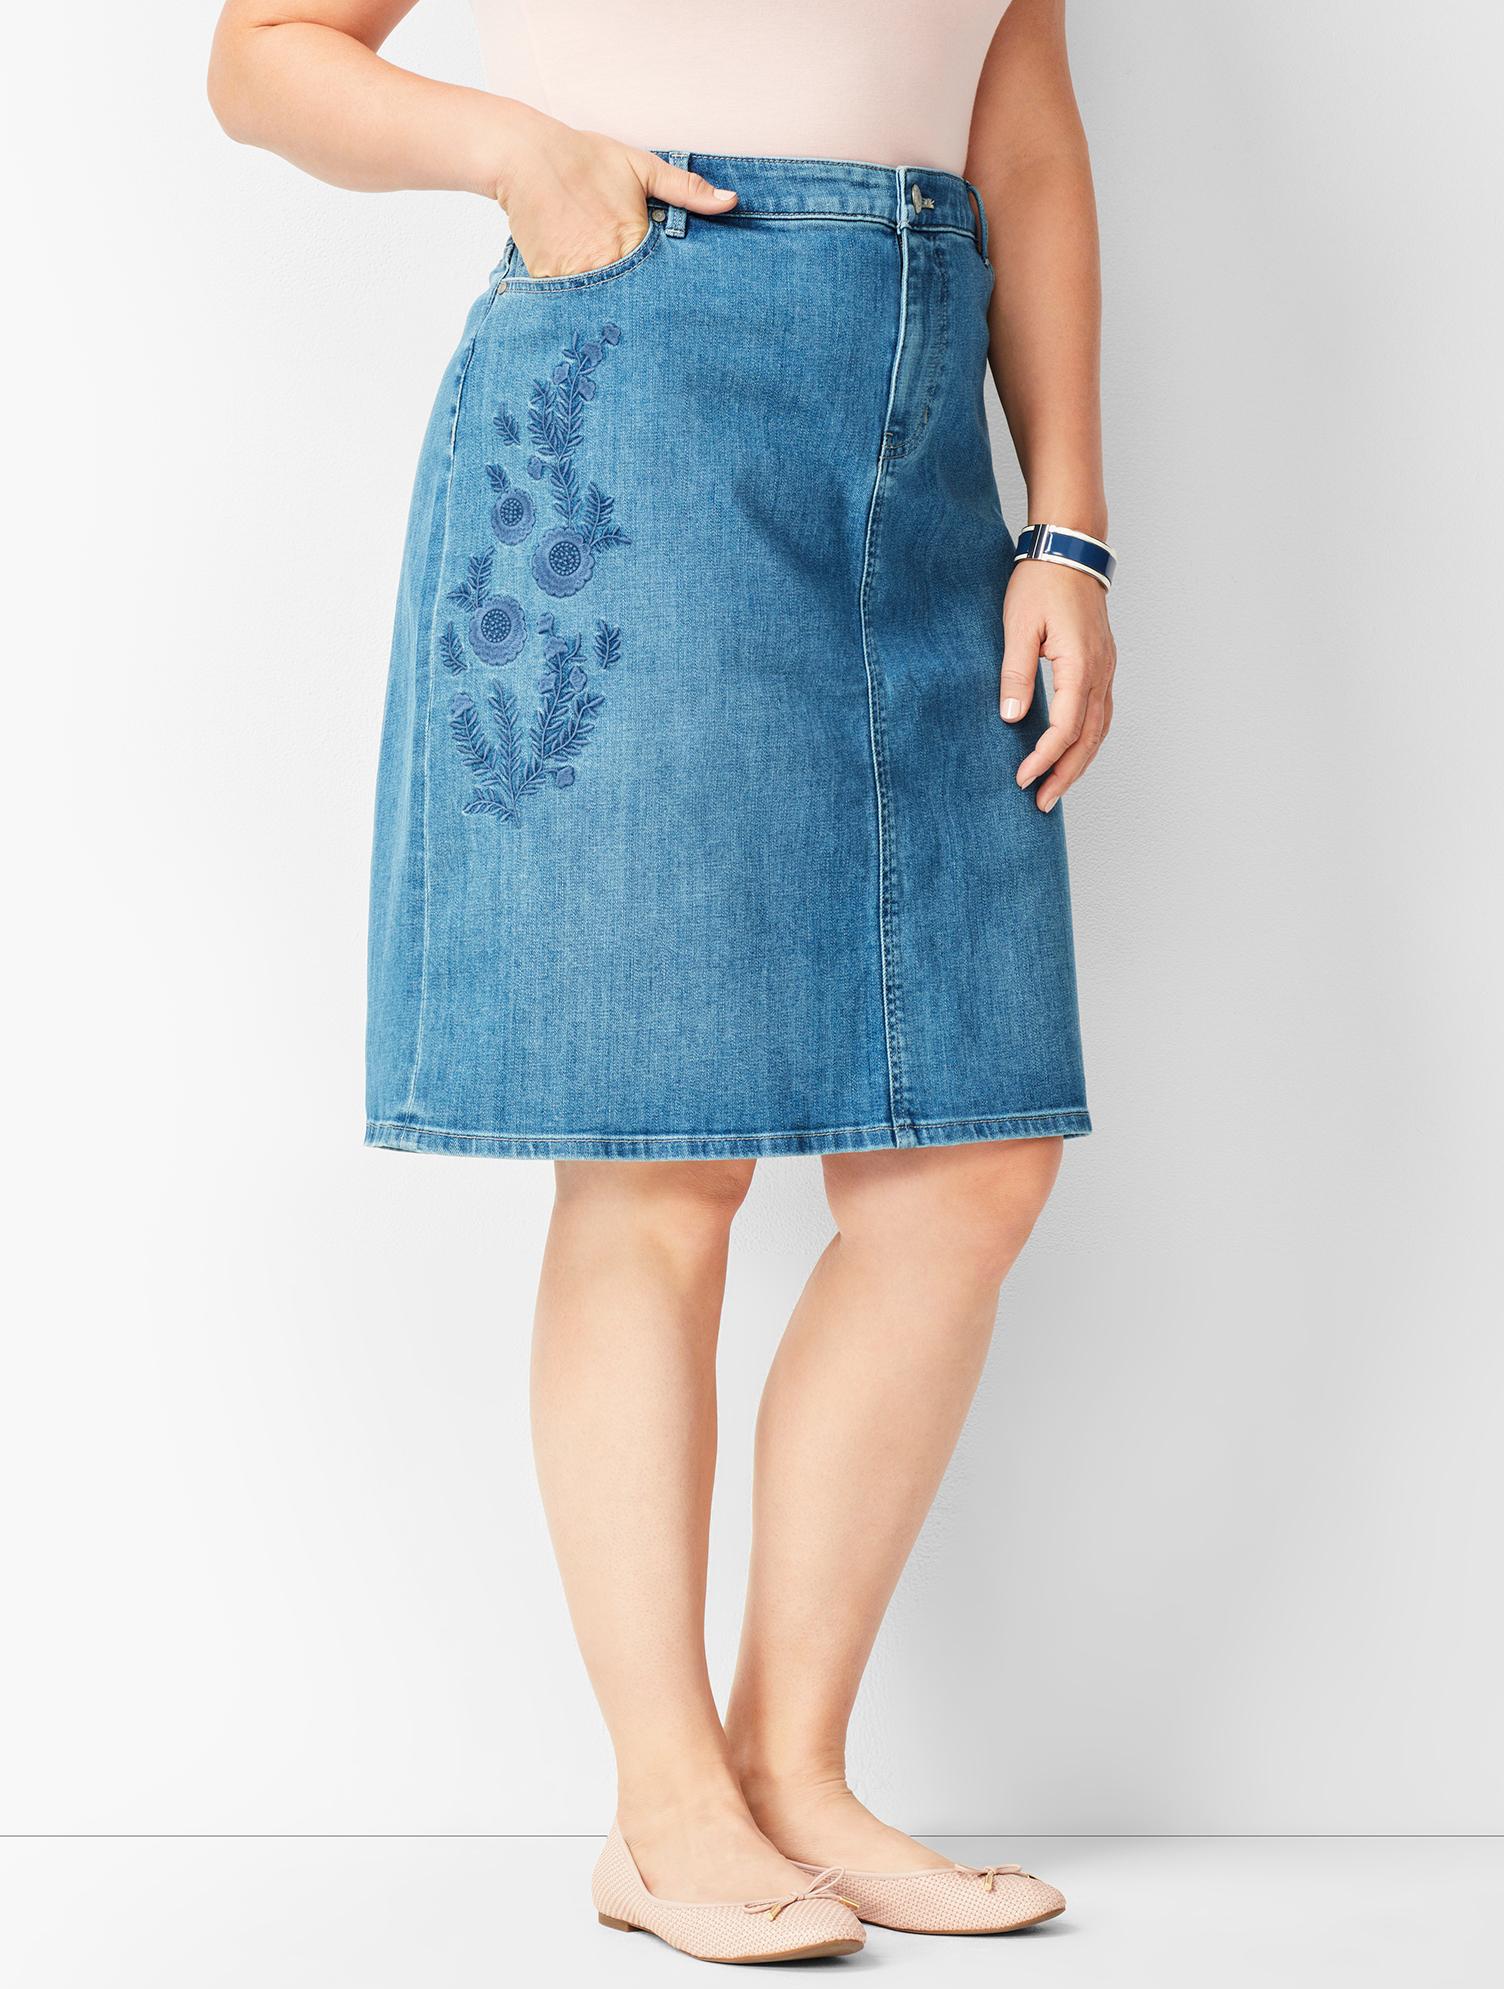 60s Skirts | 70s Hippie Skirts, Jumper Dresses Embroidered Denim Skirt - BLUE-MOON - 22 - Talbots $26.24 AT vintagedancer.com